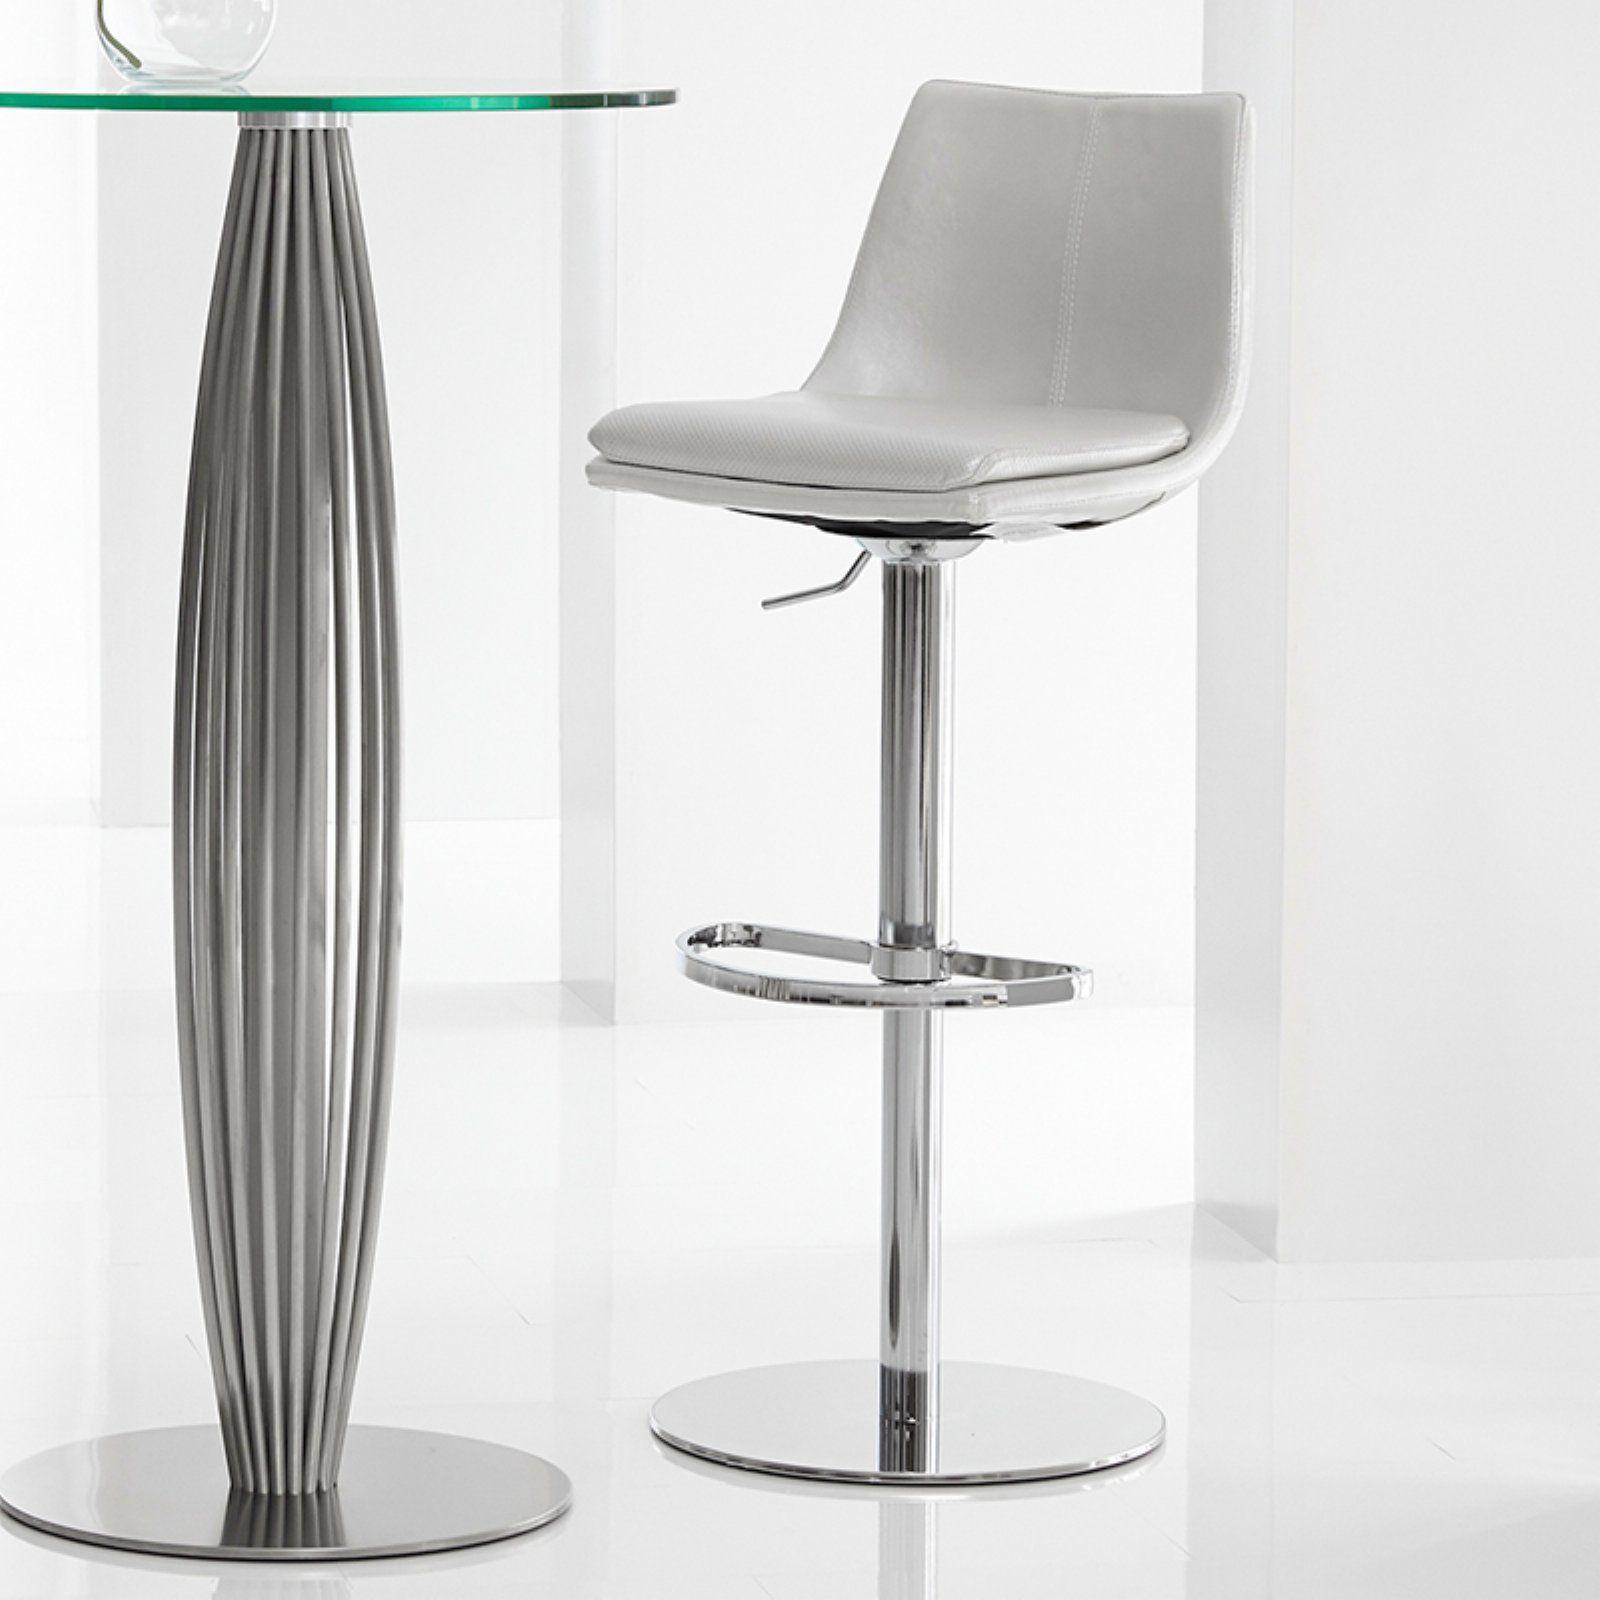 Groovy Bellini Modern Living Monte Carlo Adjustable Swivel Bar Theyellowbook Wood Chair Design Ideas Theyellowbookinfo